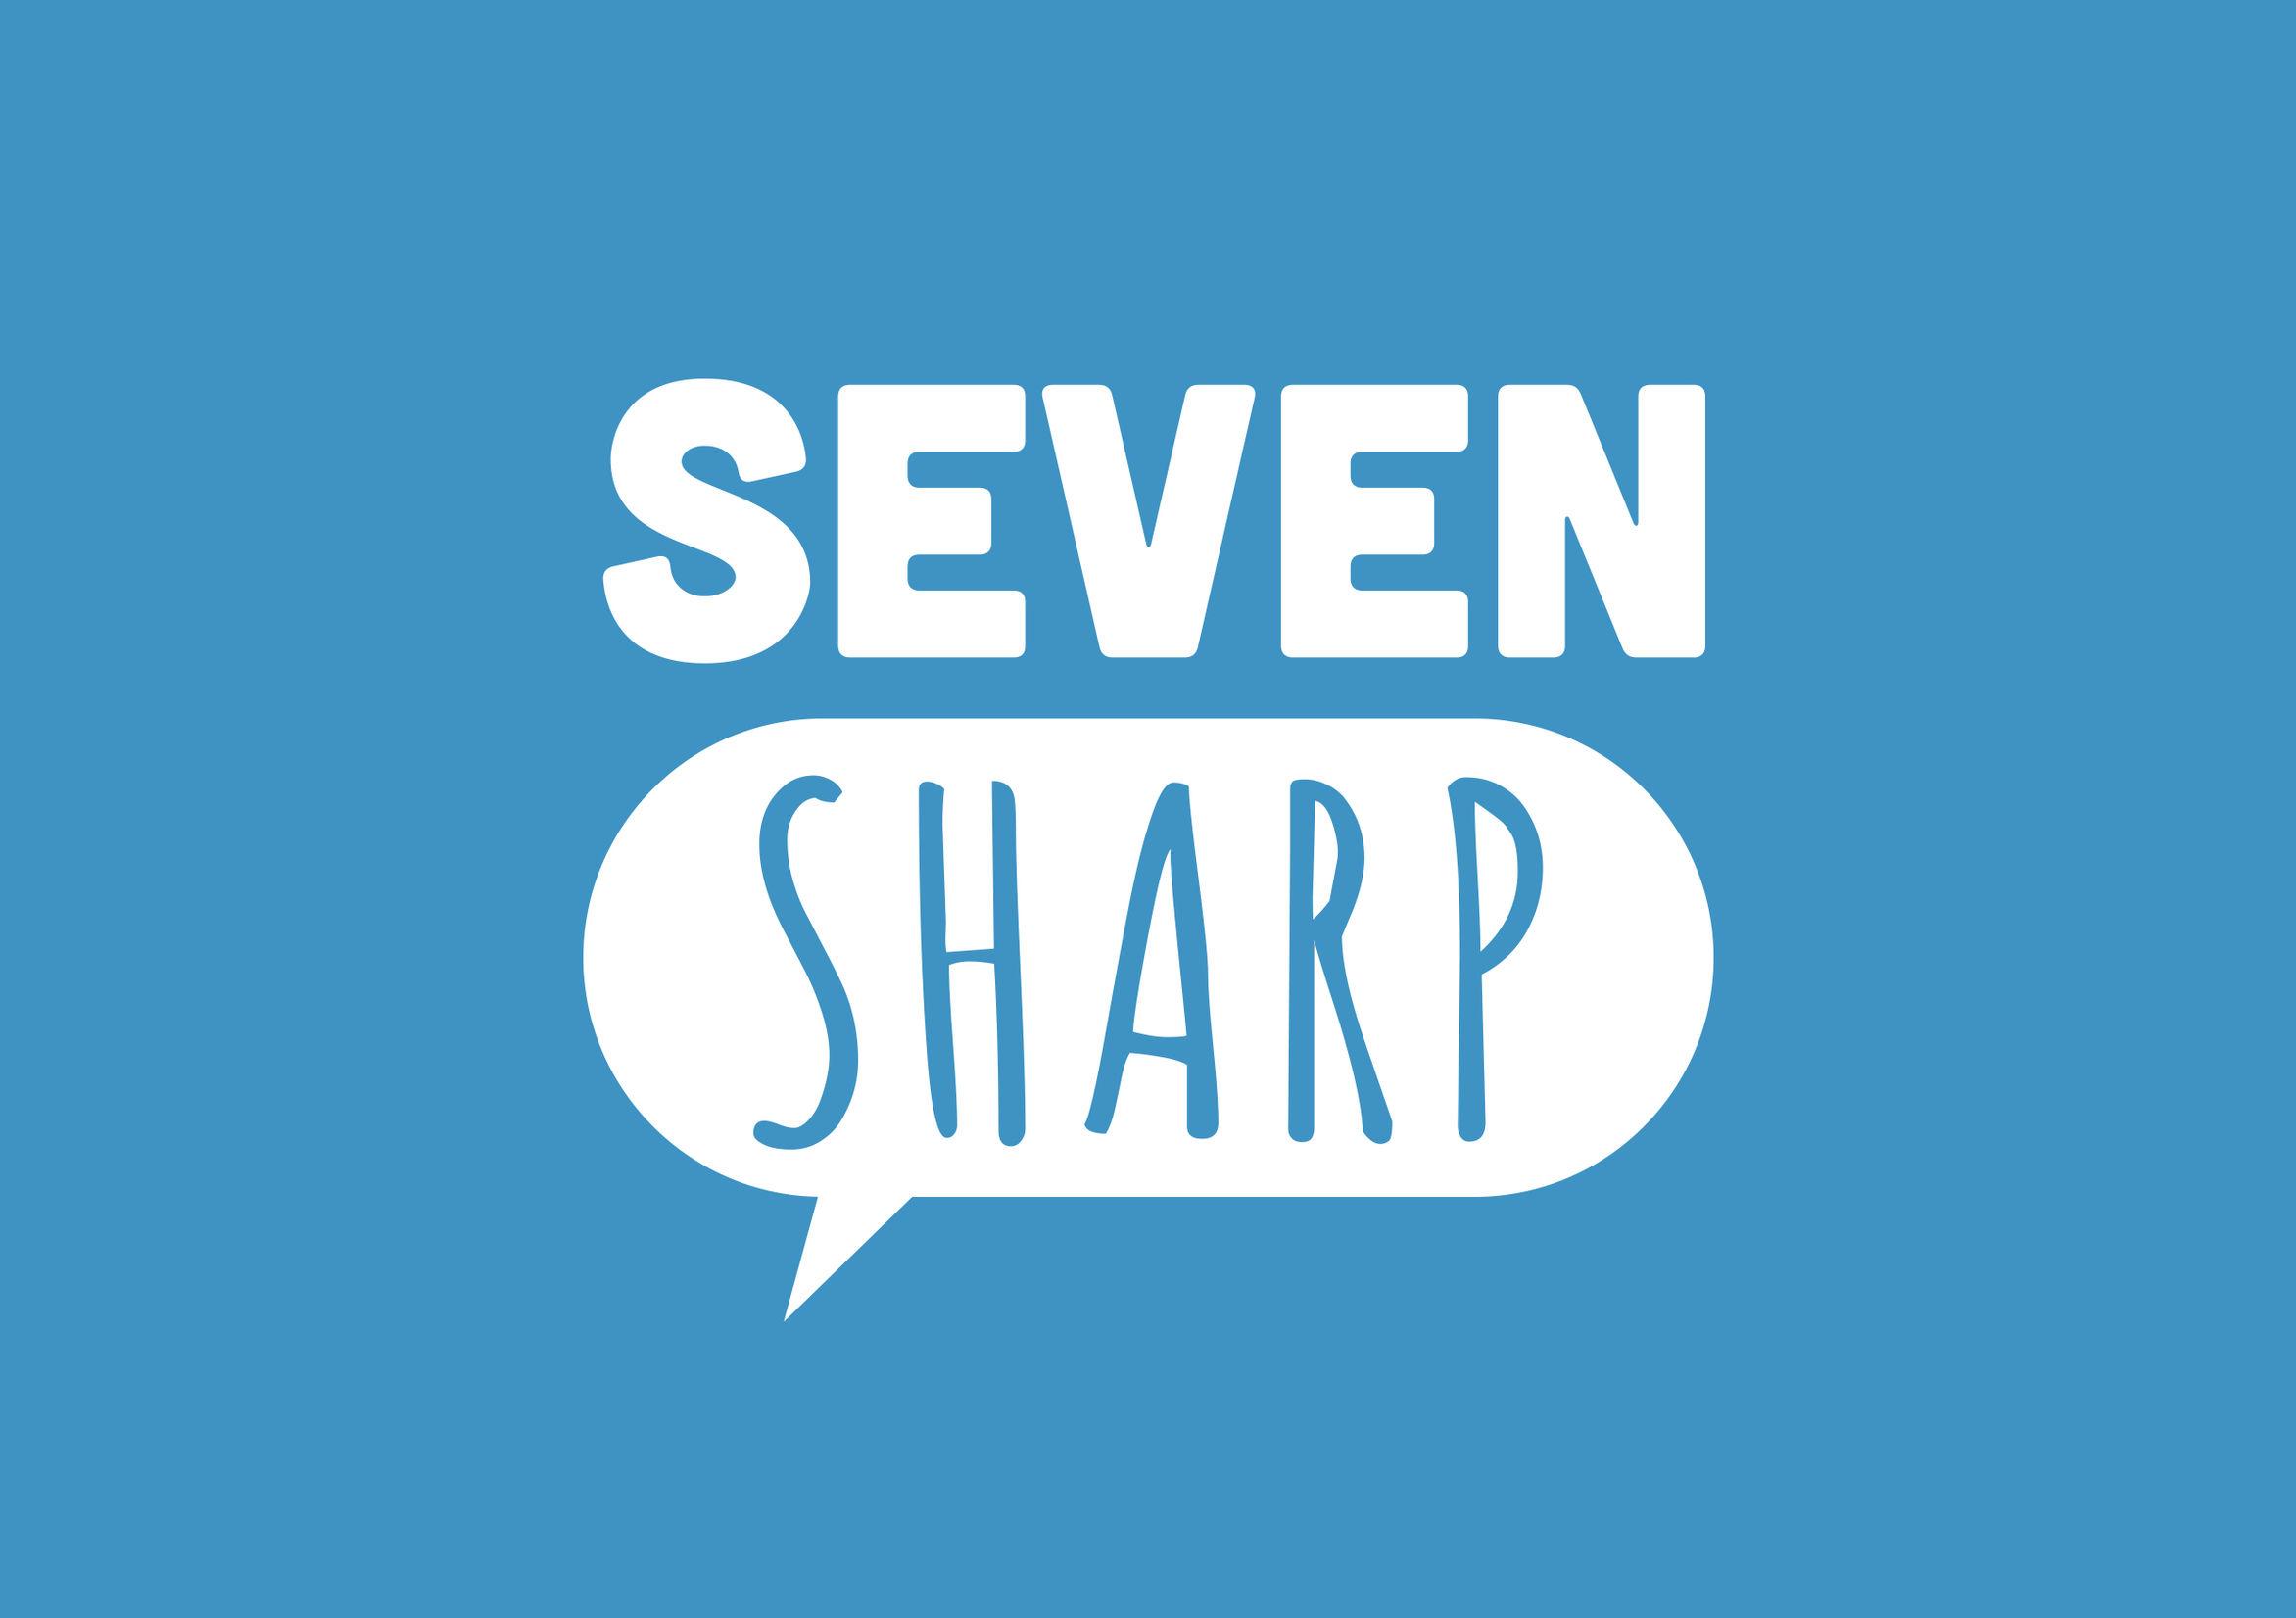 SevenSharp move it mama.jpg